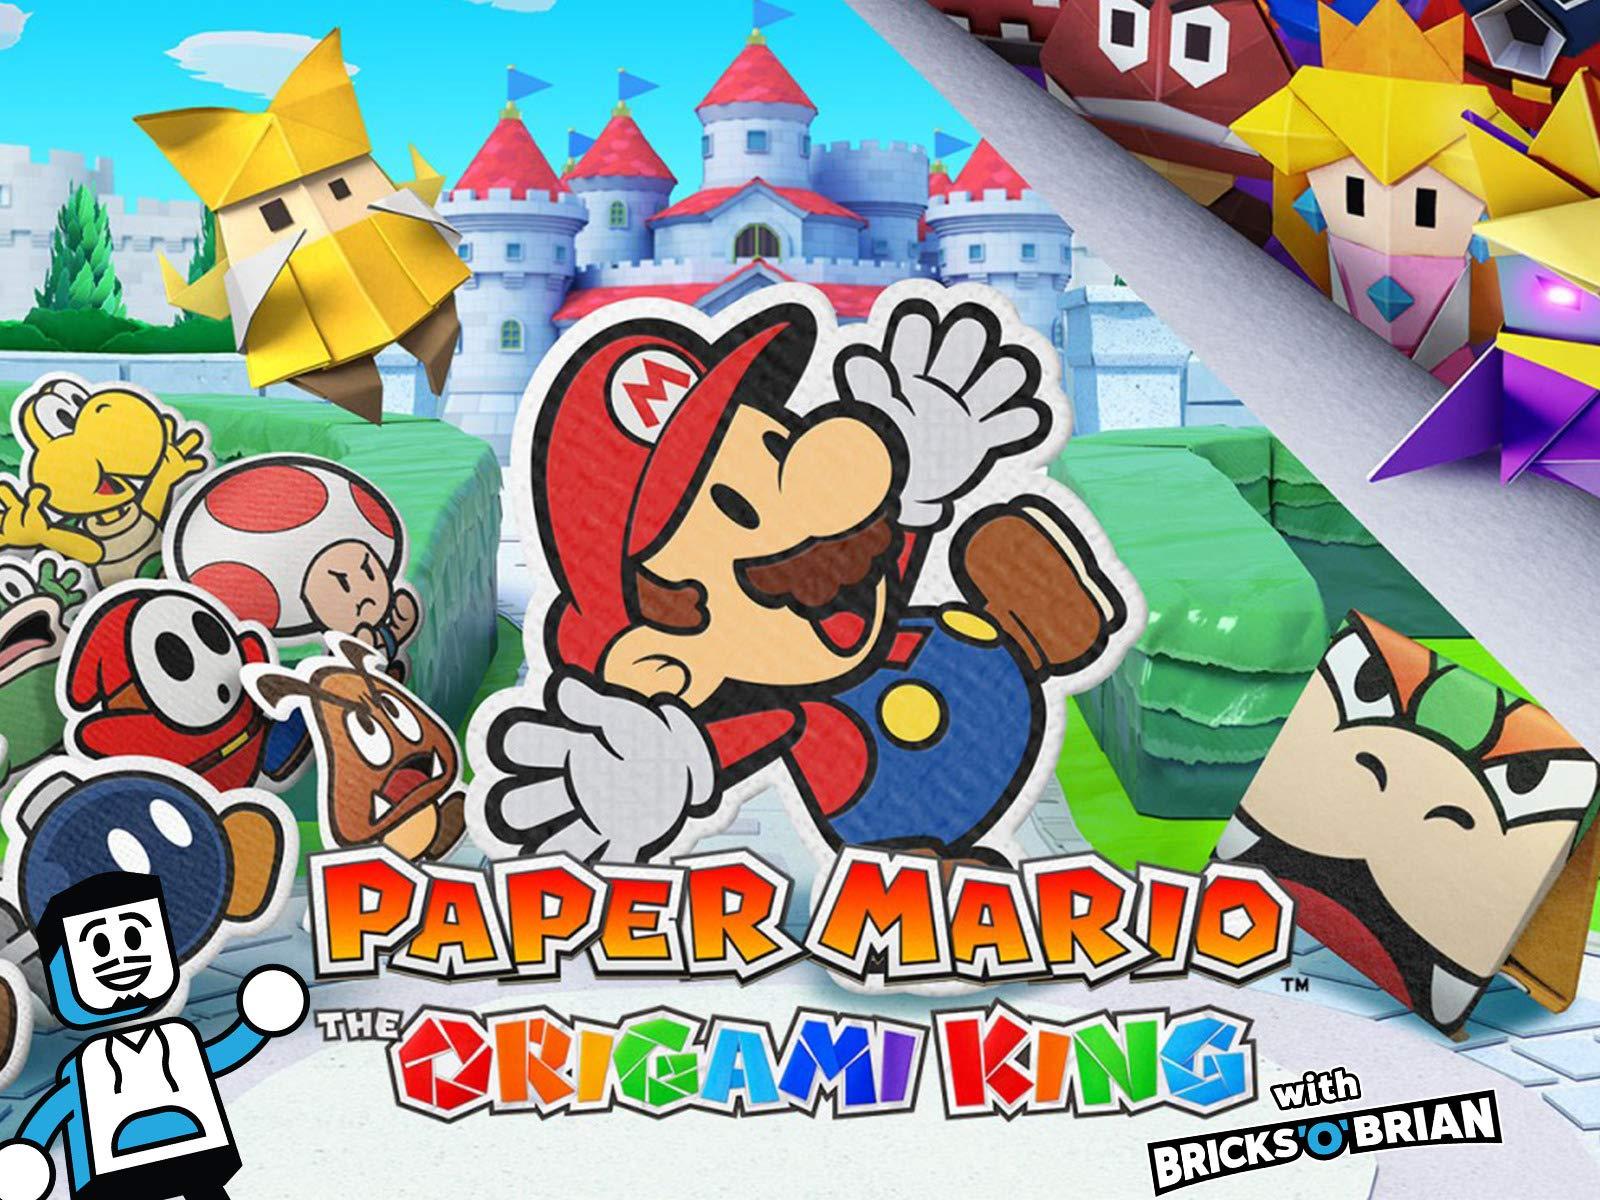 Clip: Paper Mario The Origami King with Bricks 'O' Brian - Season 1